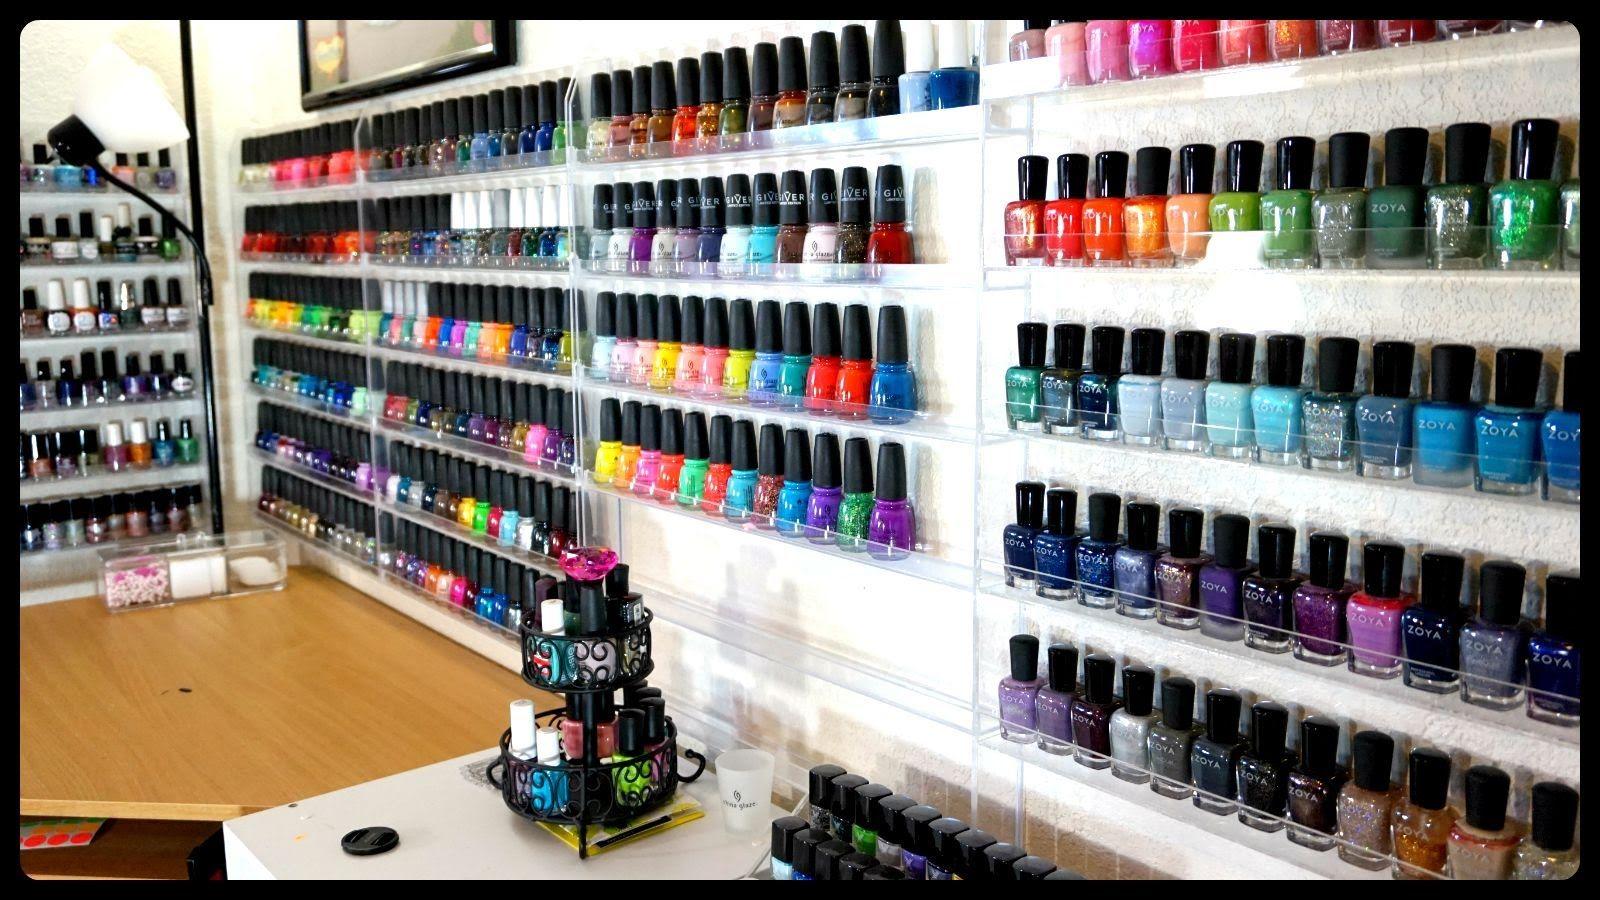 EPIC Nail Polish Collection & Storage!!!